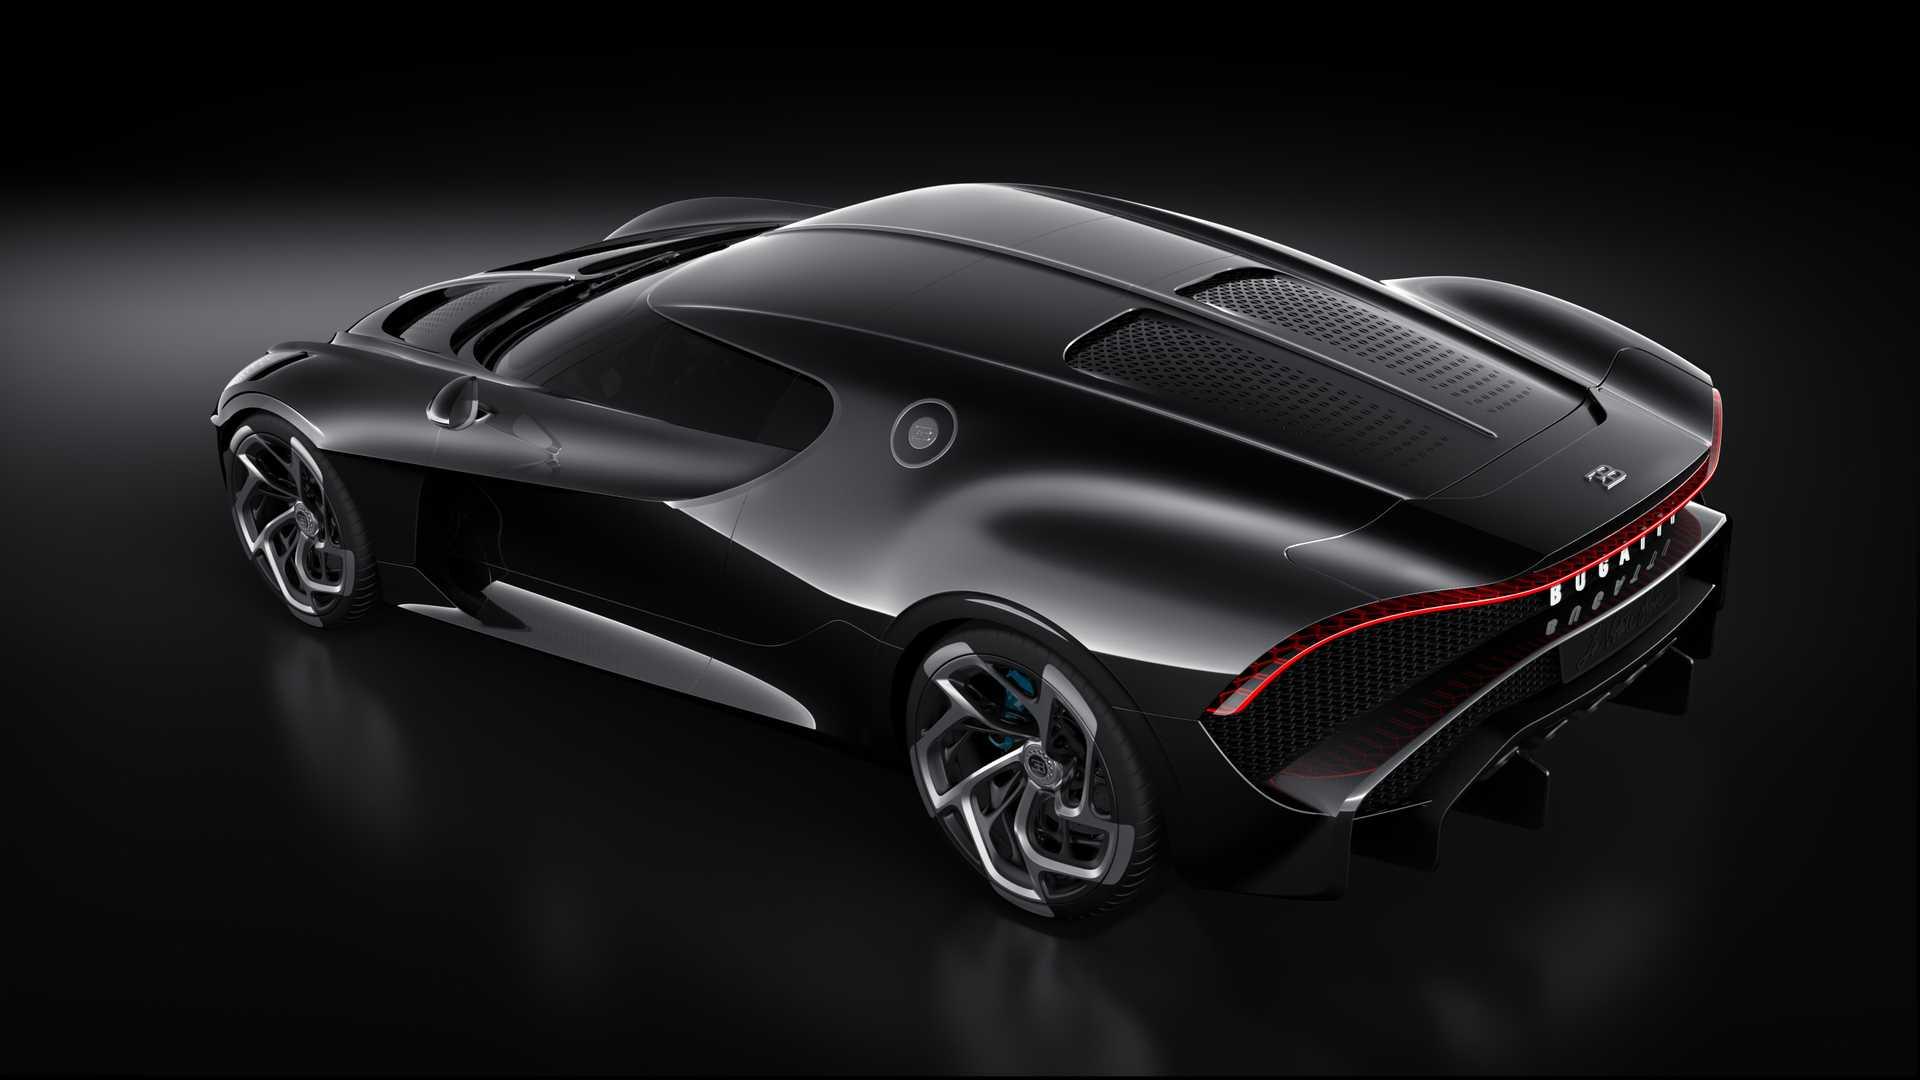 Bugatti La Voiture Noire: $18.7M Bugatti La Voiture Noire Has A Dark Secret